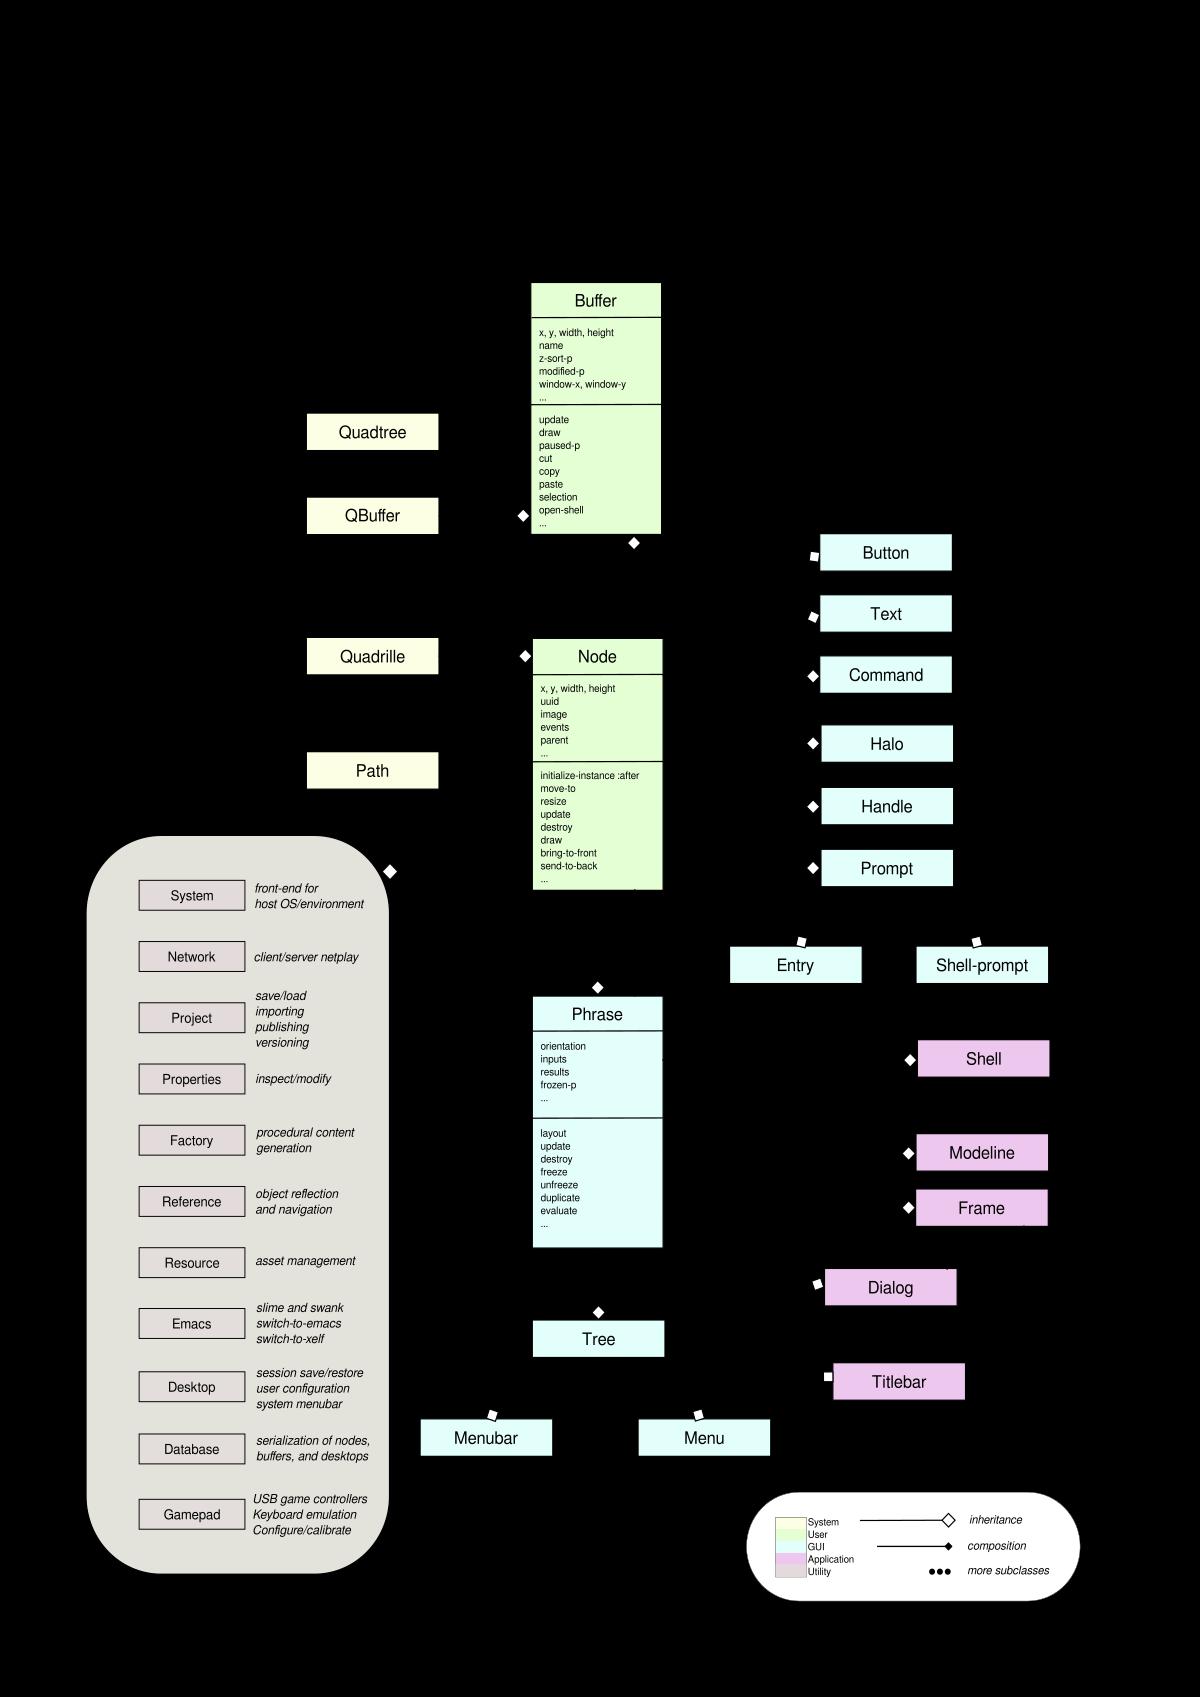 doc/class-diagram-1.0.png